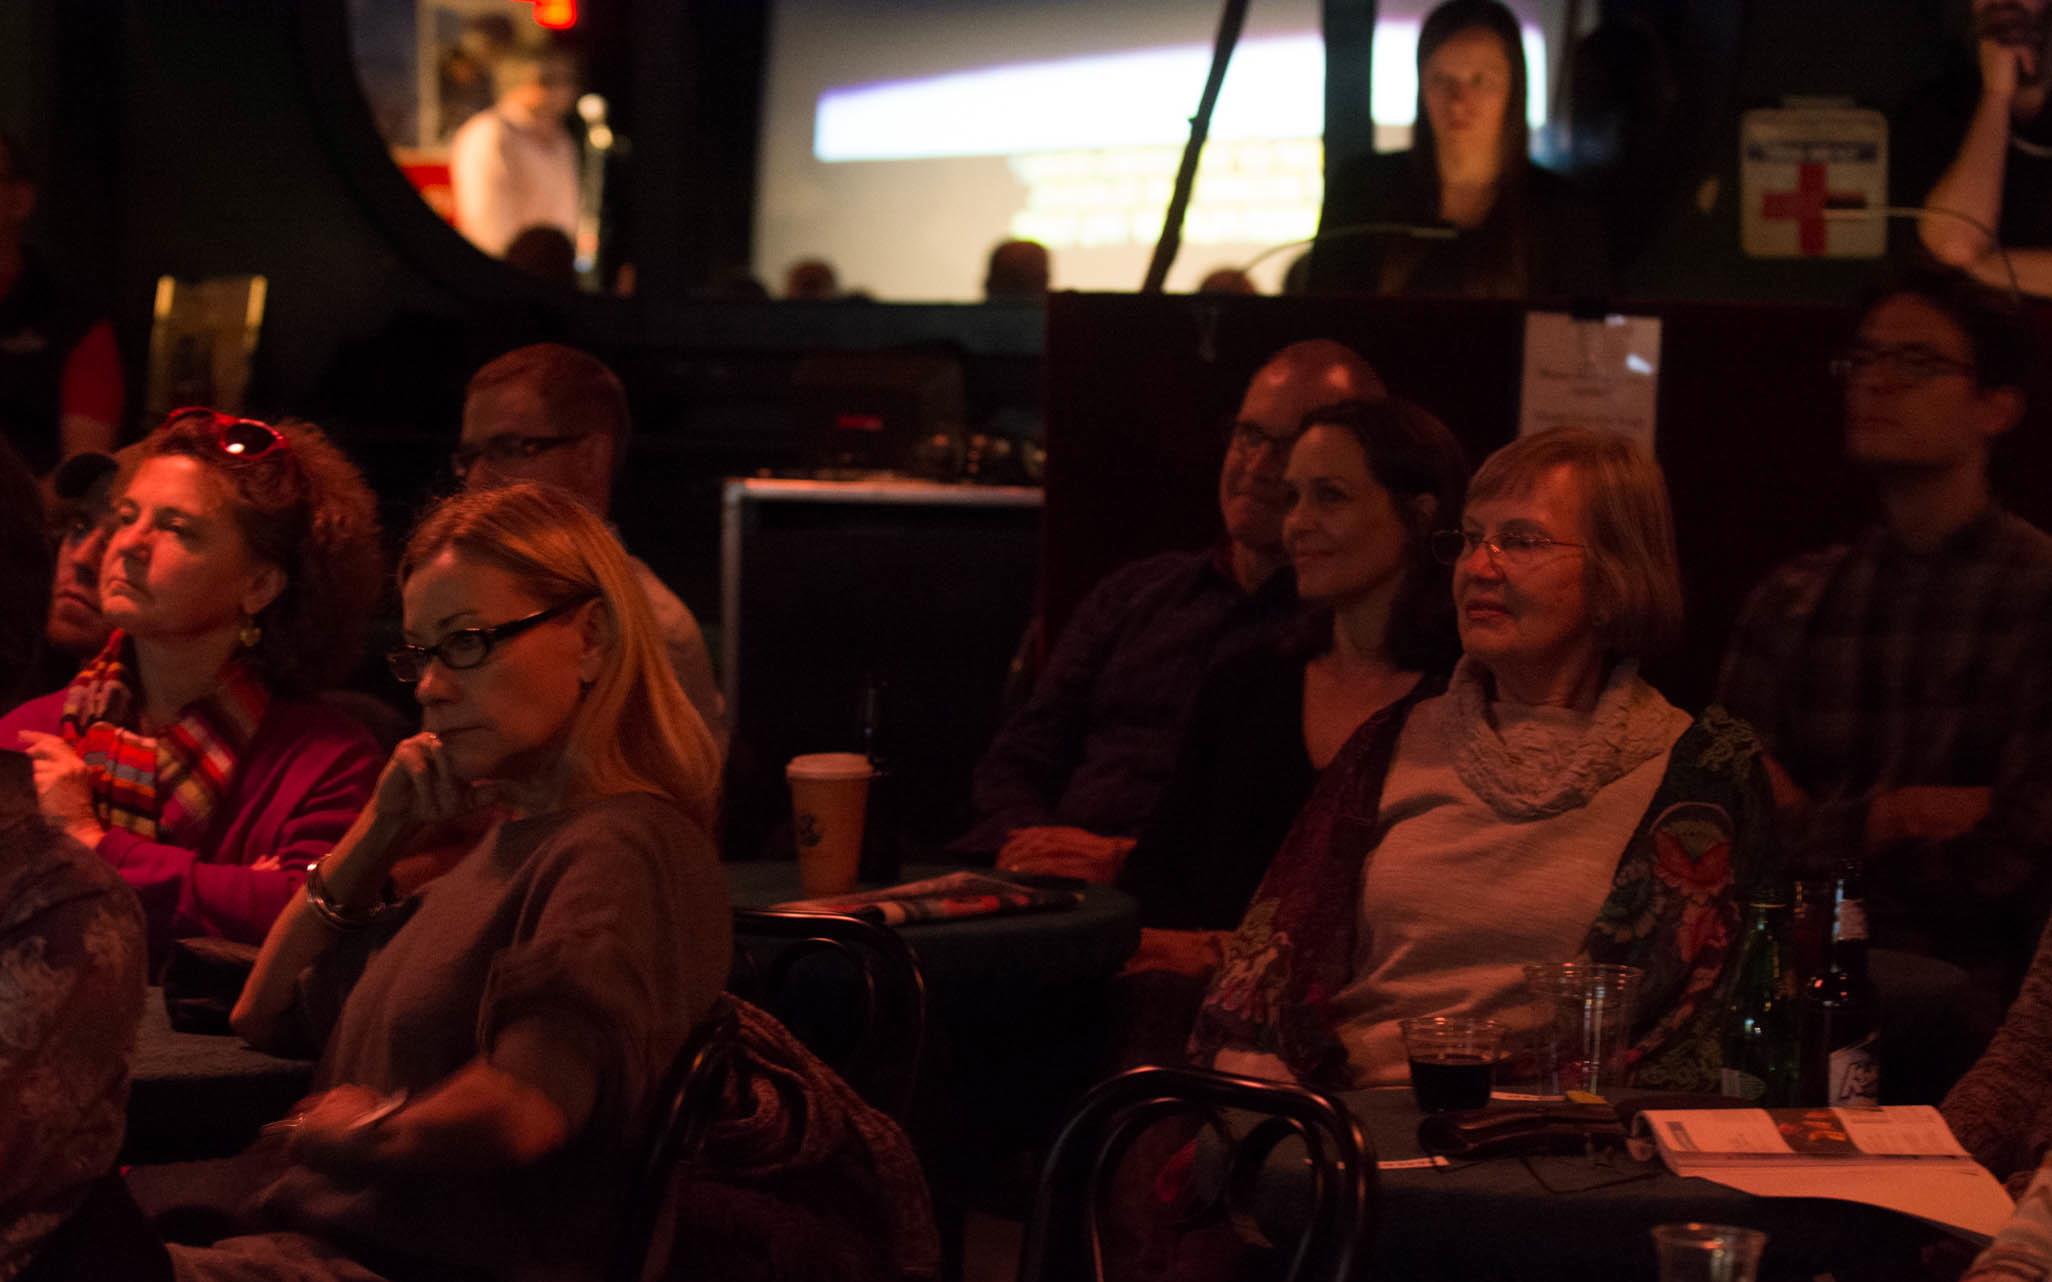 Crowd 6 - Ryeberg Live Banff 2013